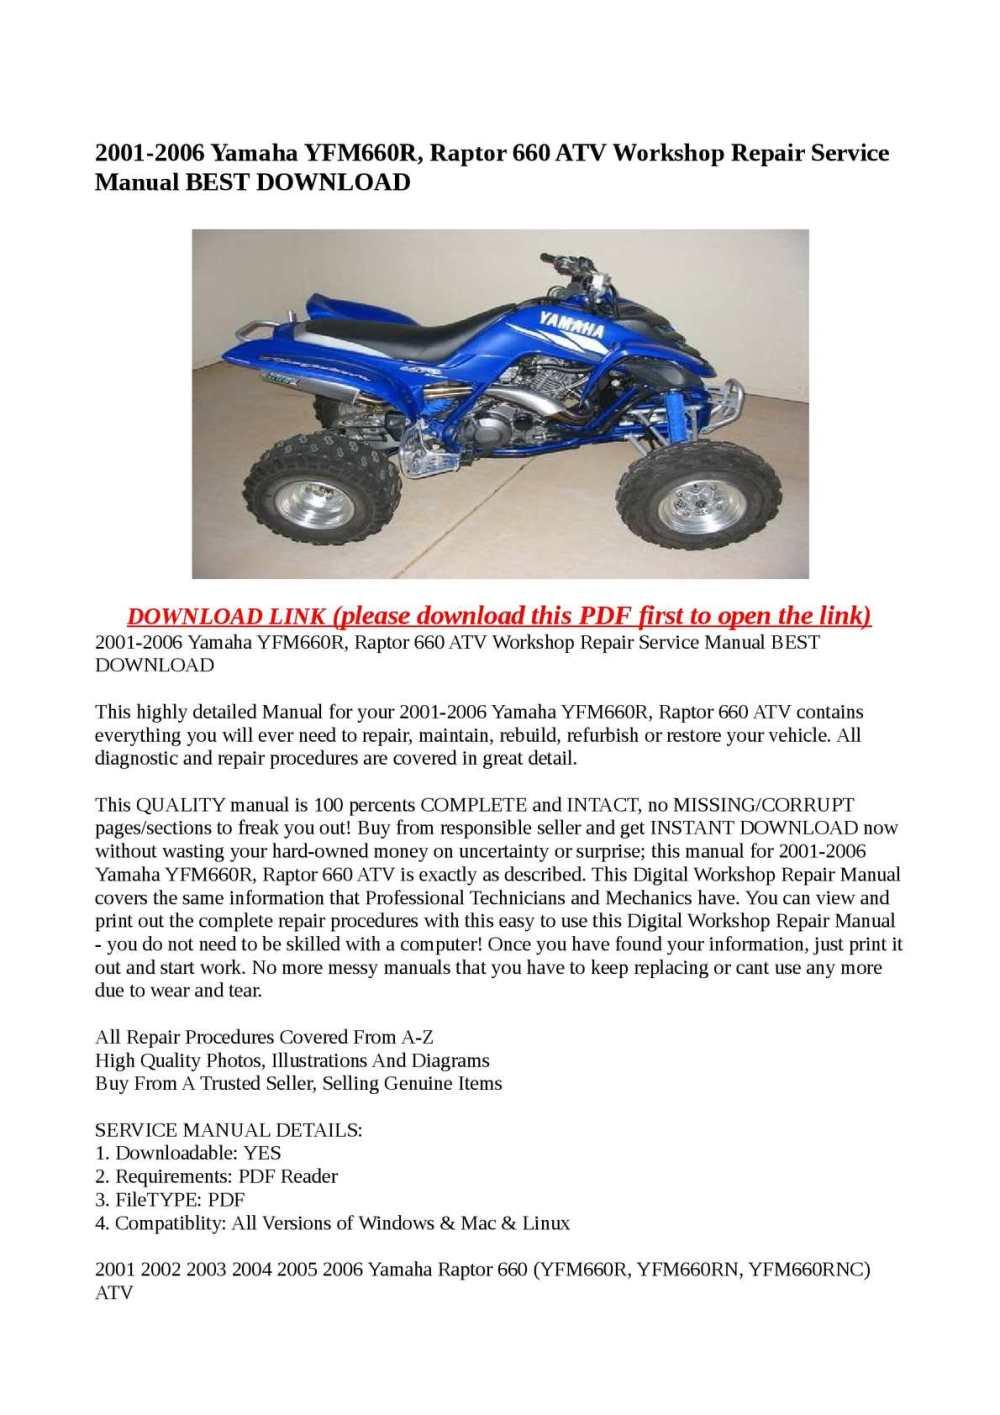 medium resolution of 2001 2006 yamaha yfm660r raptor 660 atv workshop repair service manual best download